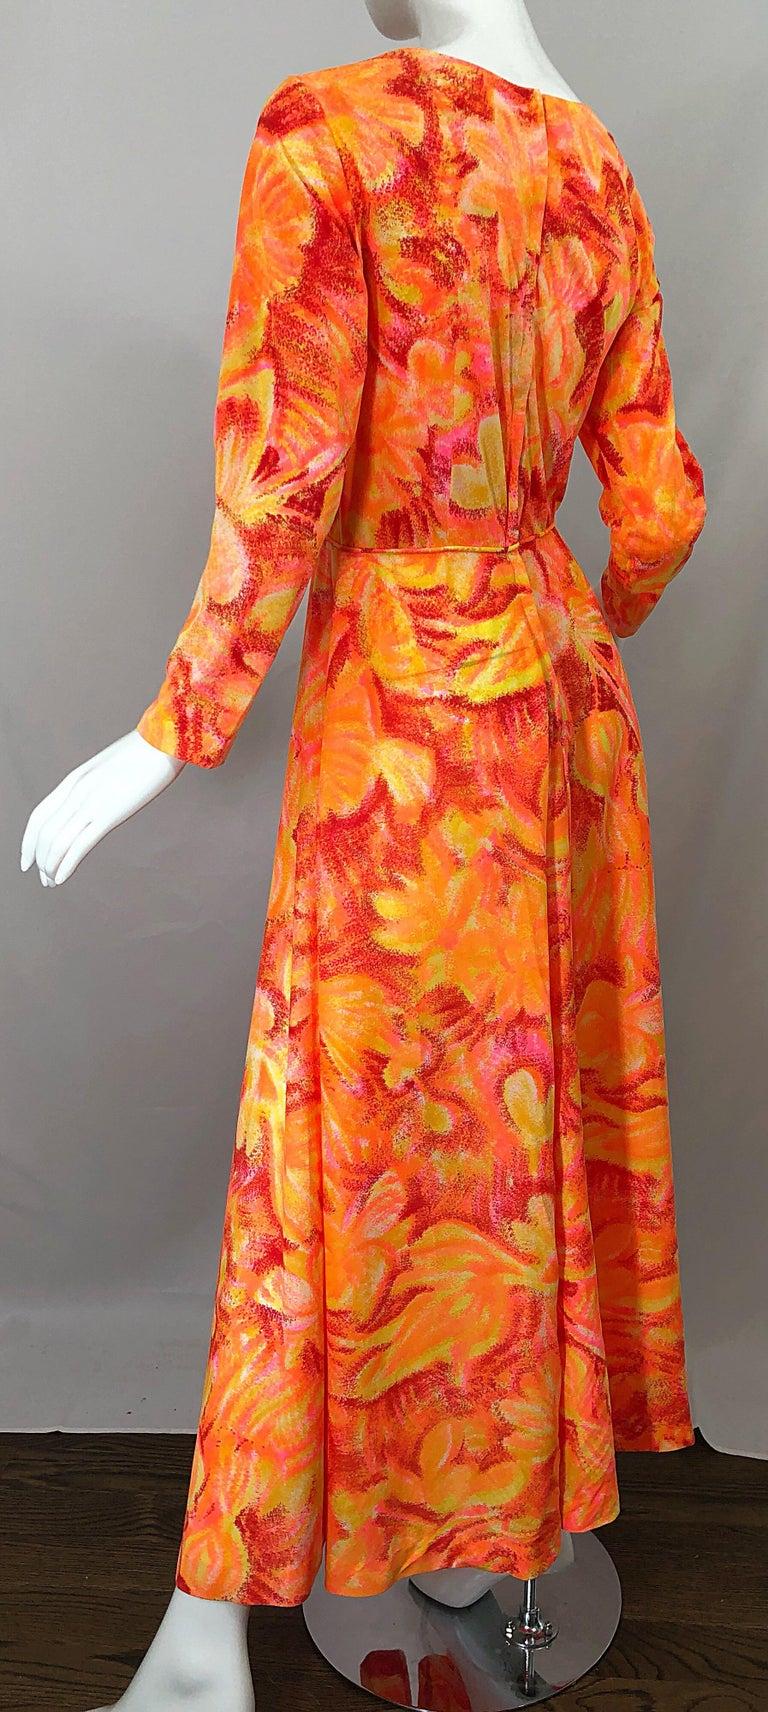 1970s Bright Neon Orange Hot Pink Abstract Flower Print